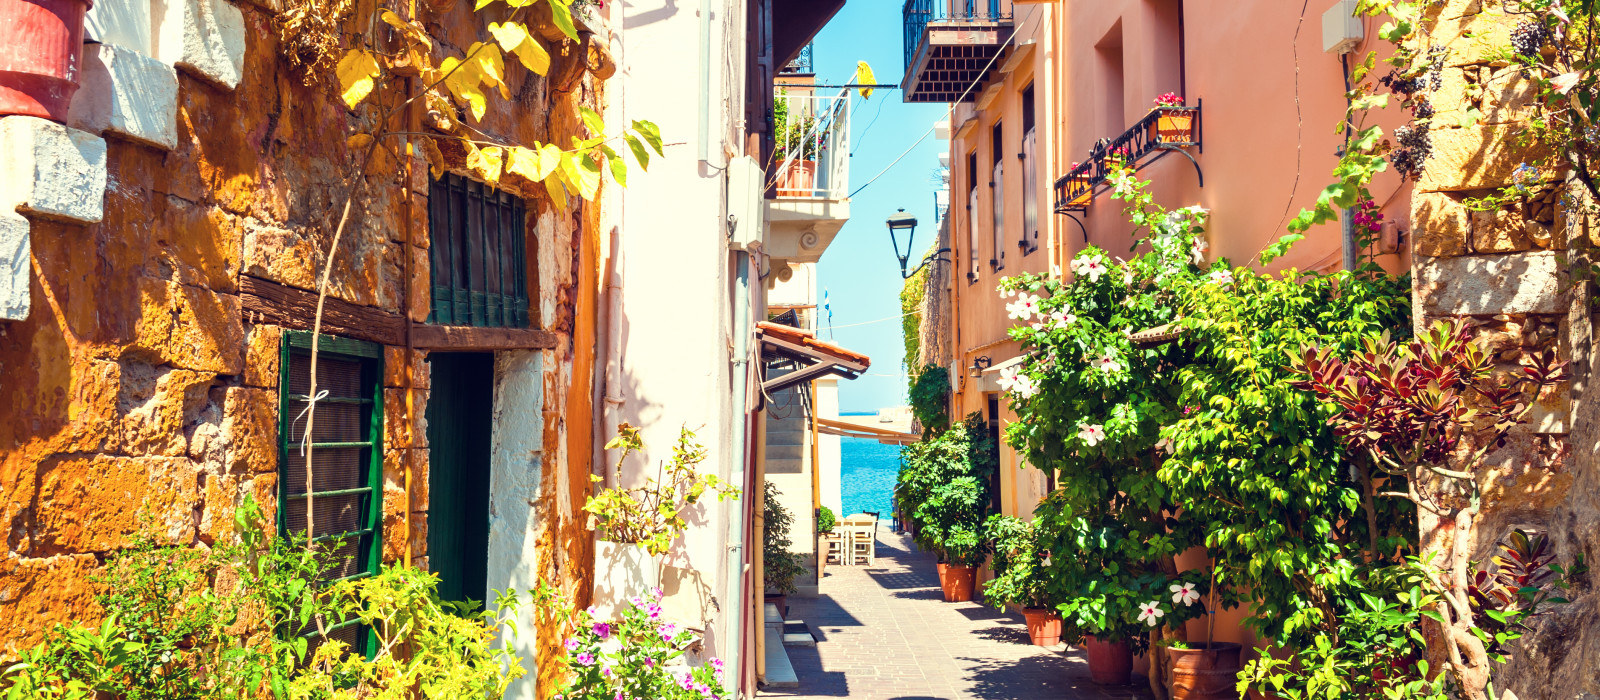 Reiseziel Chania Griechenland